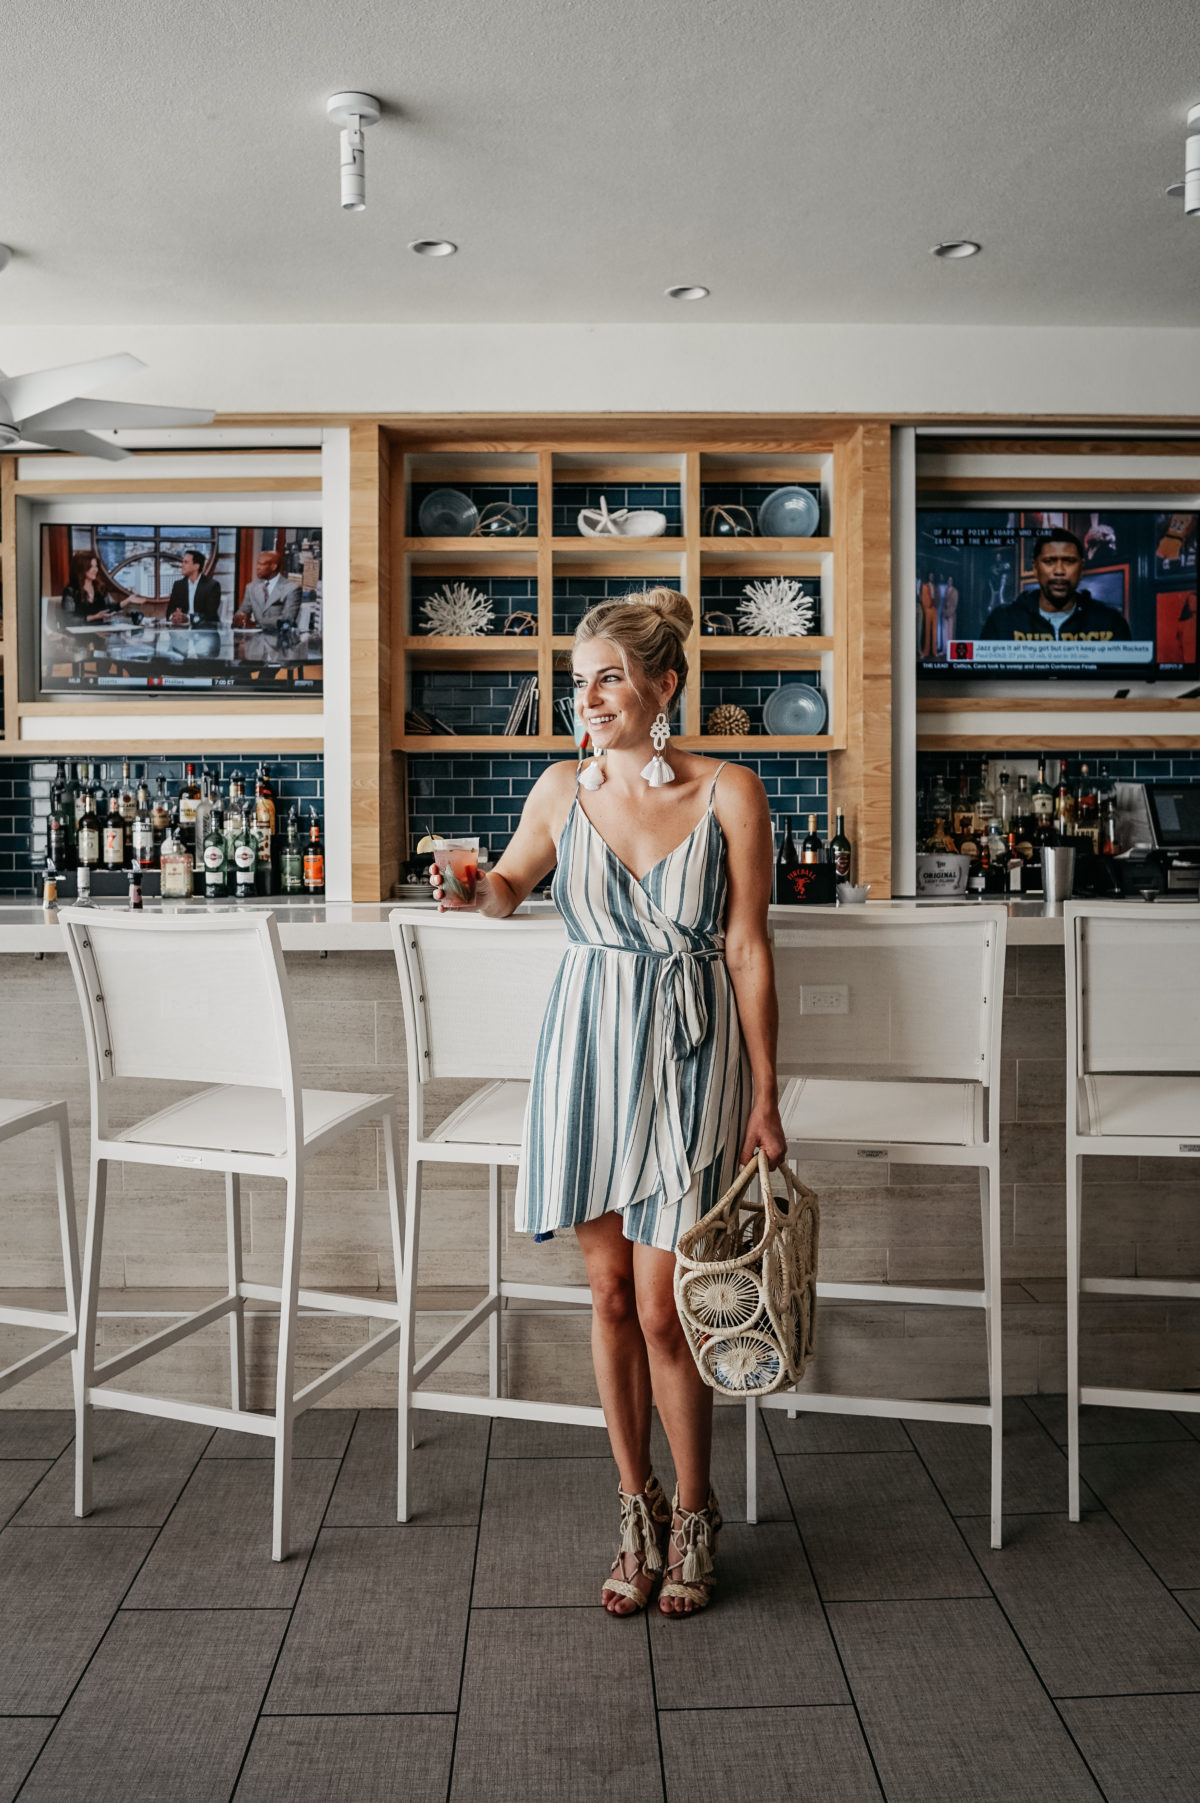 beach vacation cocktail bar attire